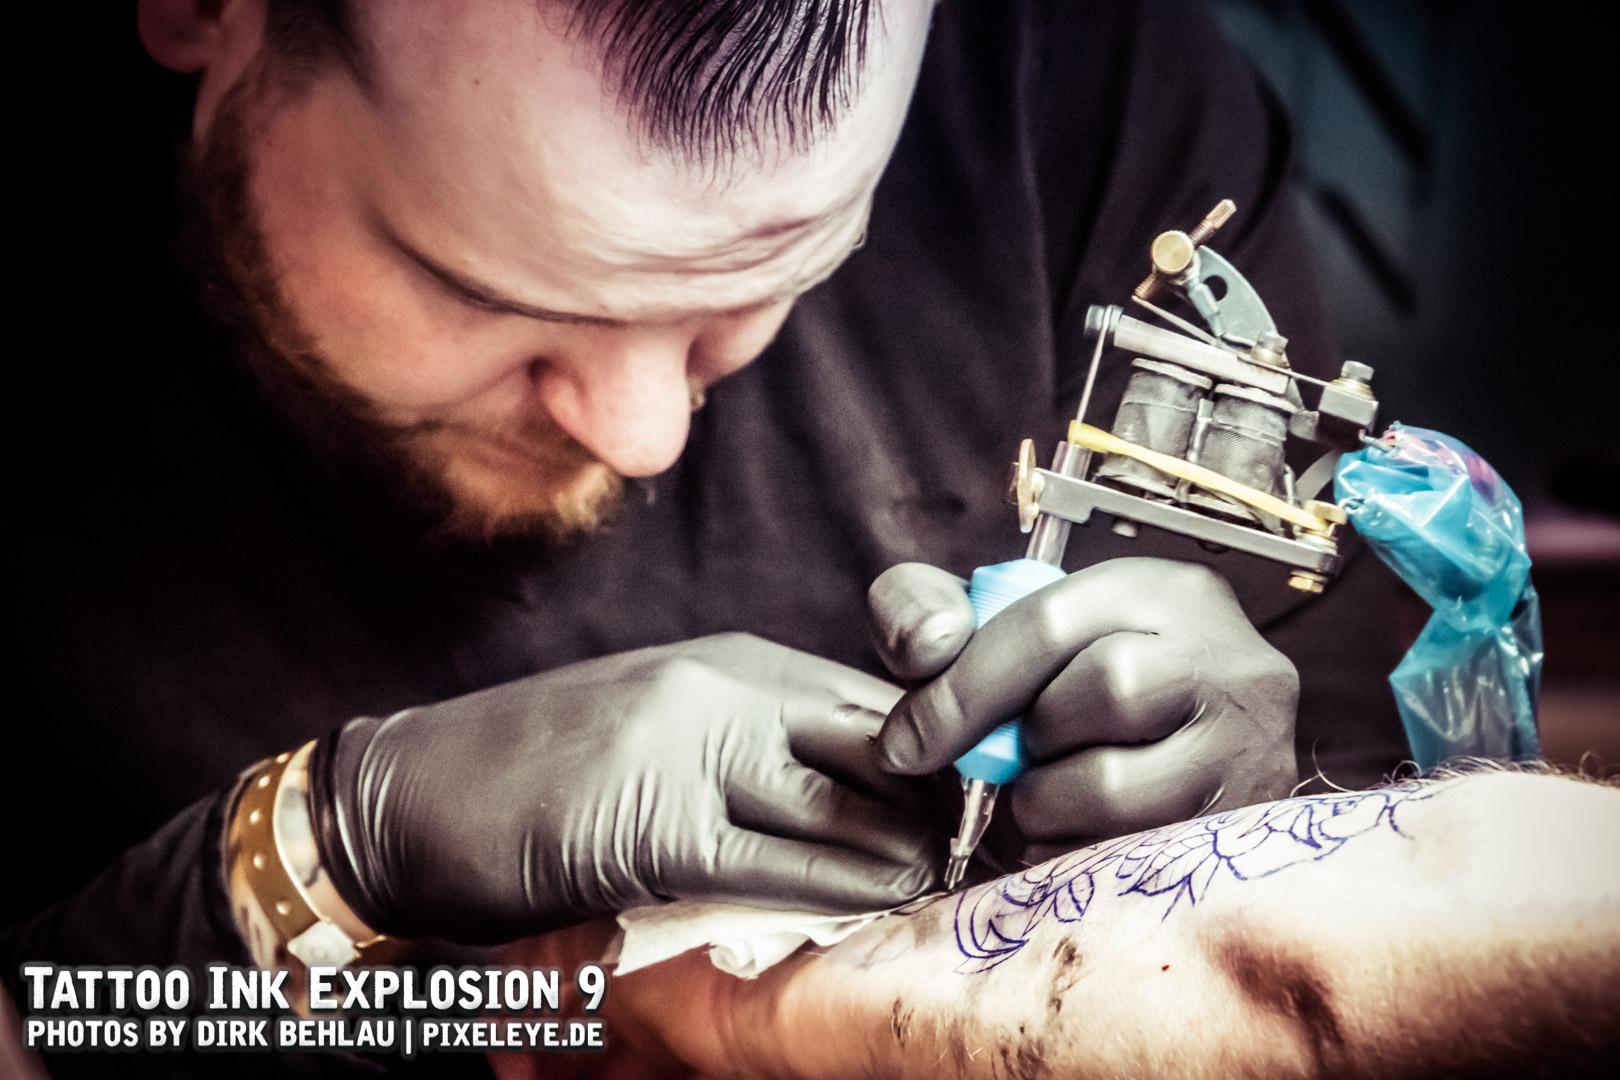 Tattoo Ink Explosion 2018 WEB by Dirk Behlau-0347.jpg